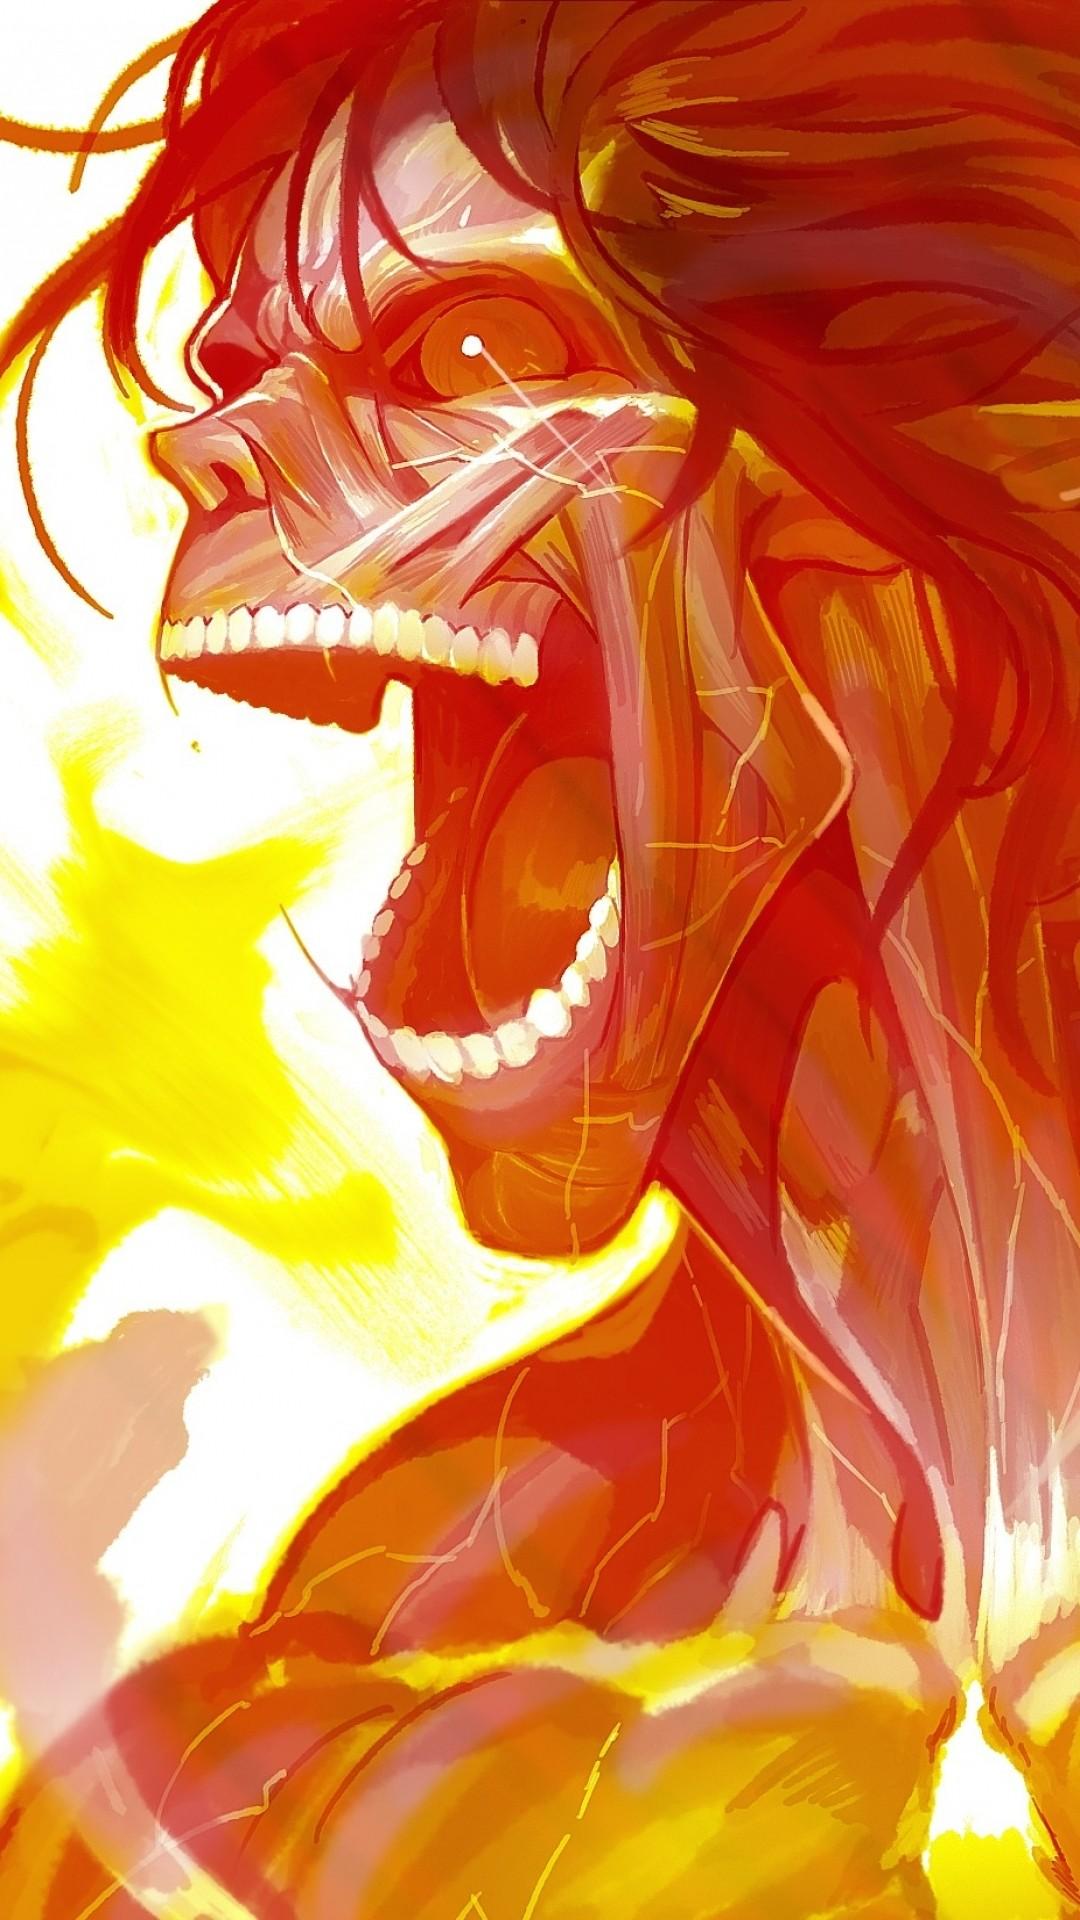 Anime Attack On Titan. Wallpaper 138693